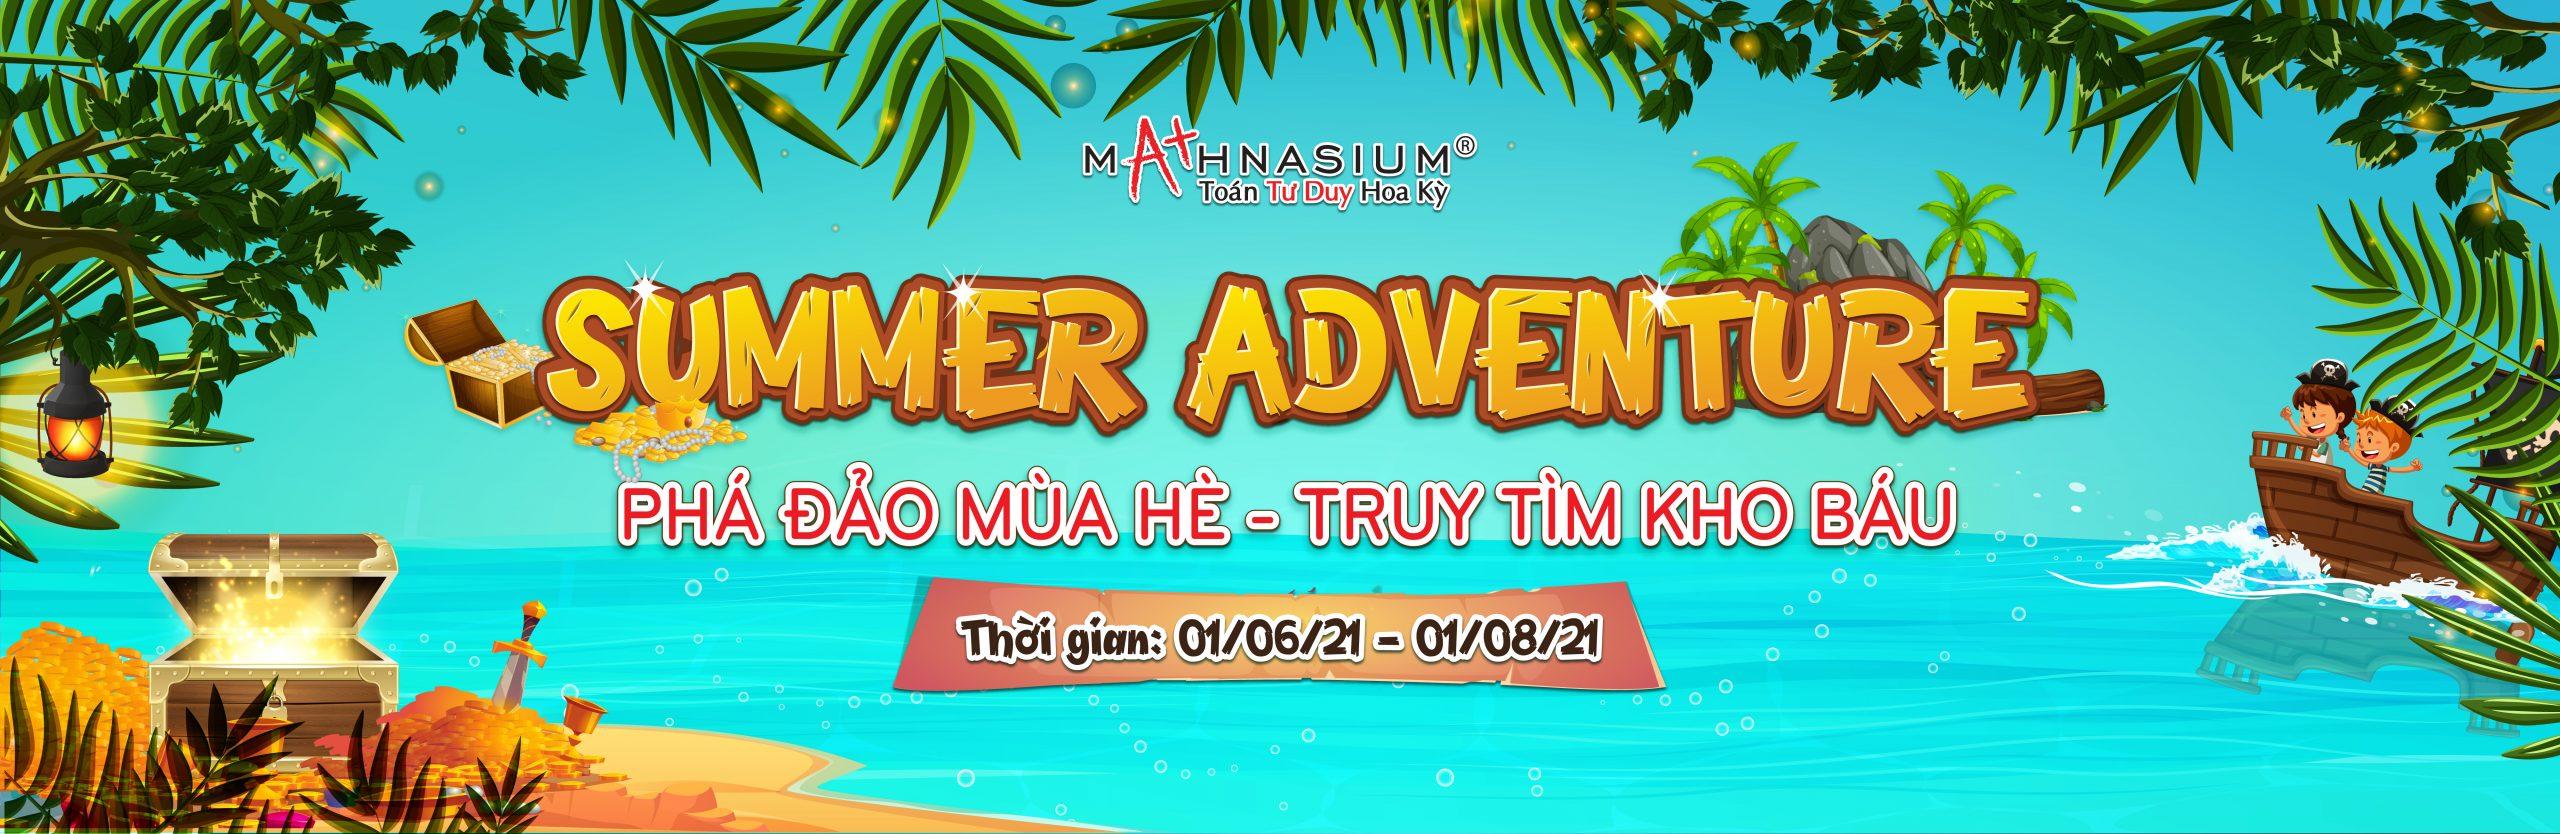 Toan tu duy Hoa Ky Mathnasium Summer Adventure